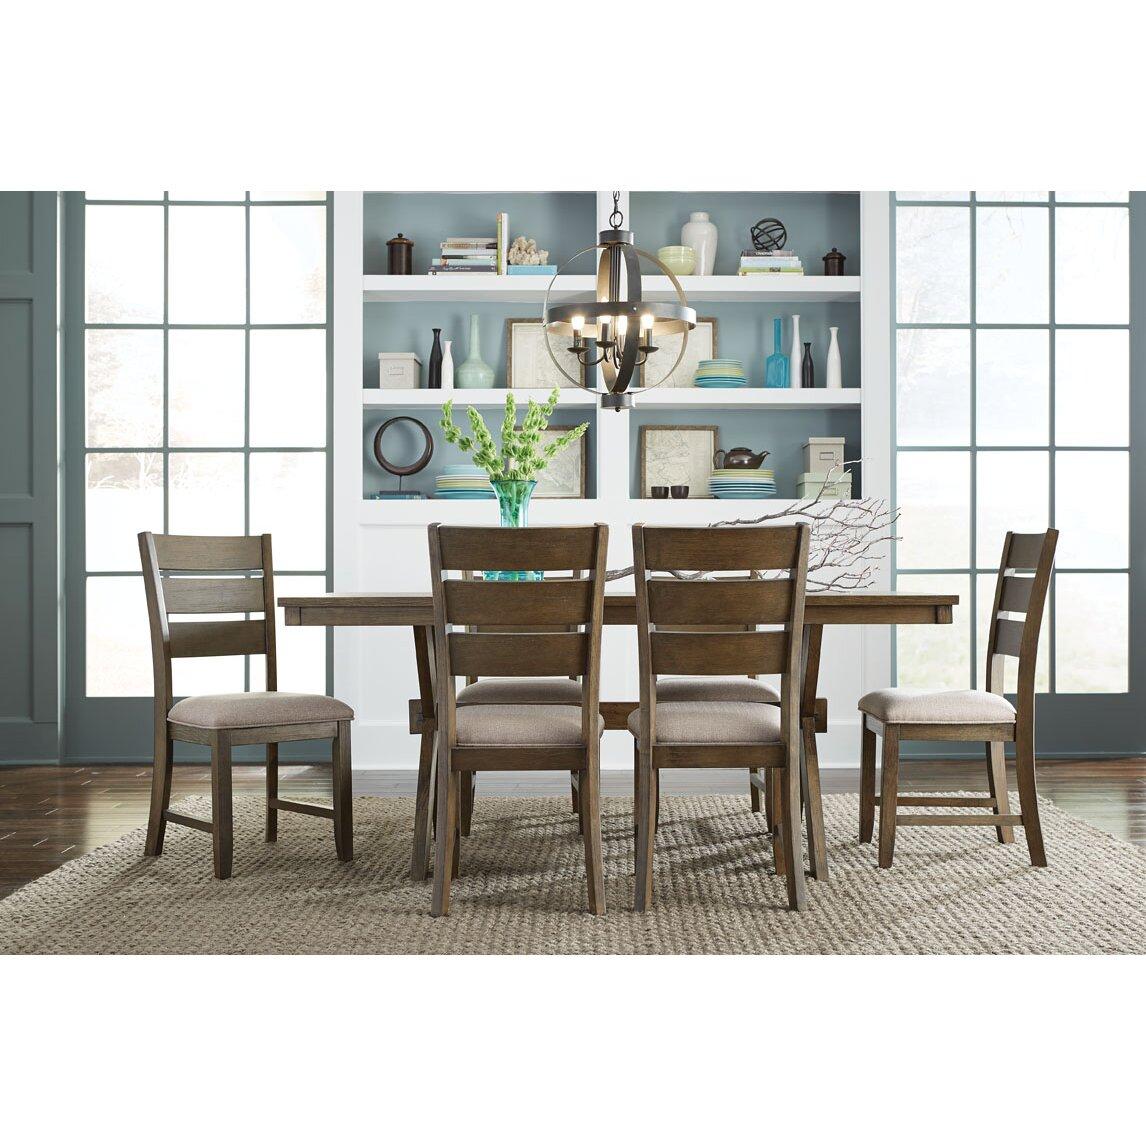 7 Piece Dinette Sets: Standard Furniture 7 Piece Dining Set & Reviews